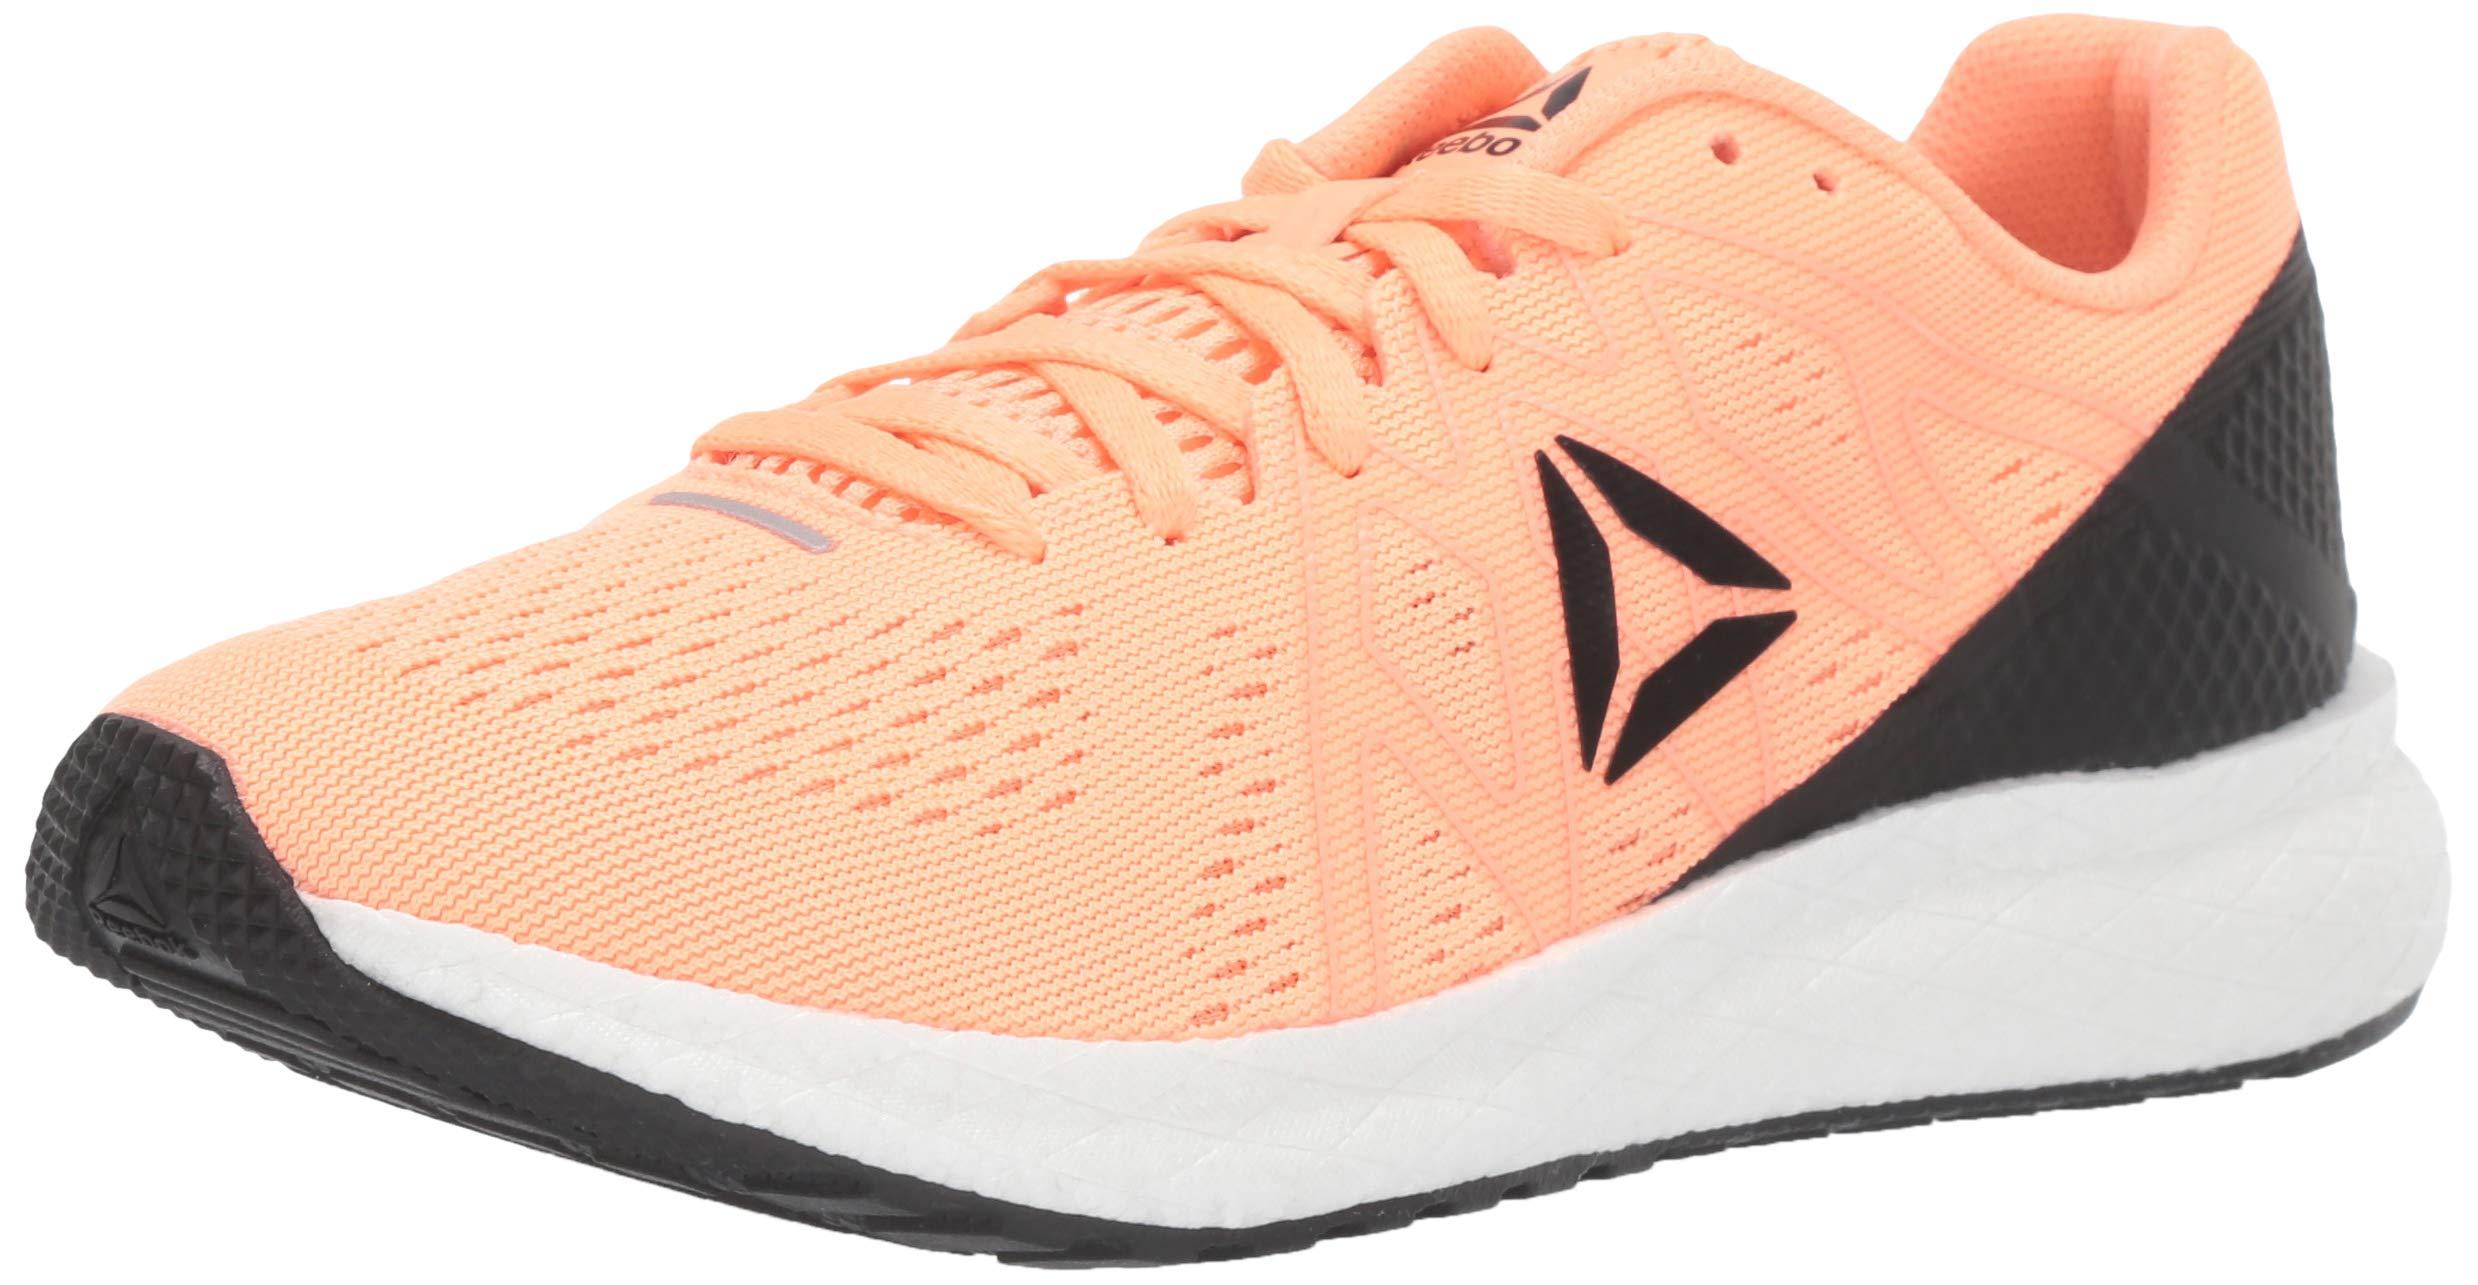 Reebok Women's Forever Floatride Energy Running Shoe, Sunglow/Black/White, 9 M US by Reebok